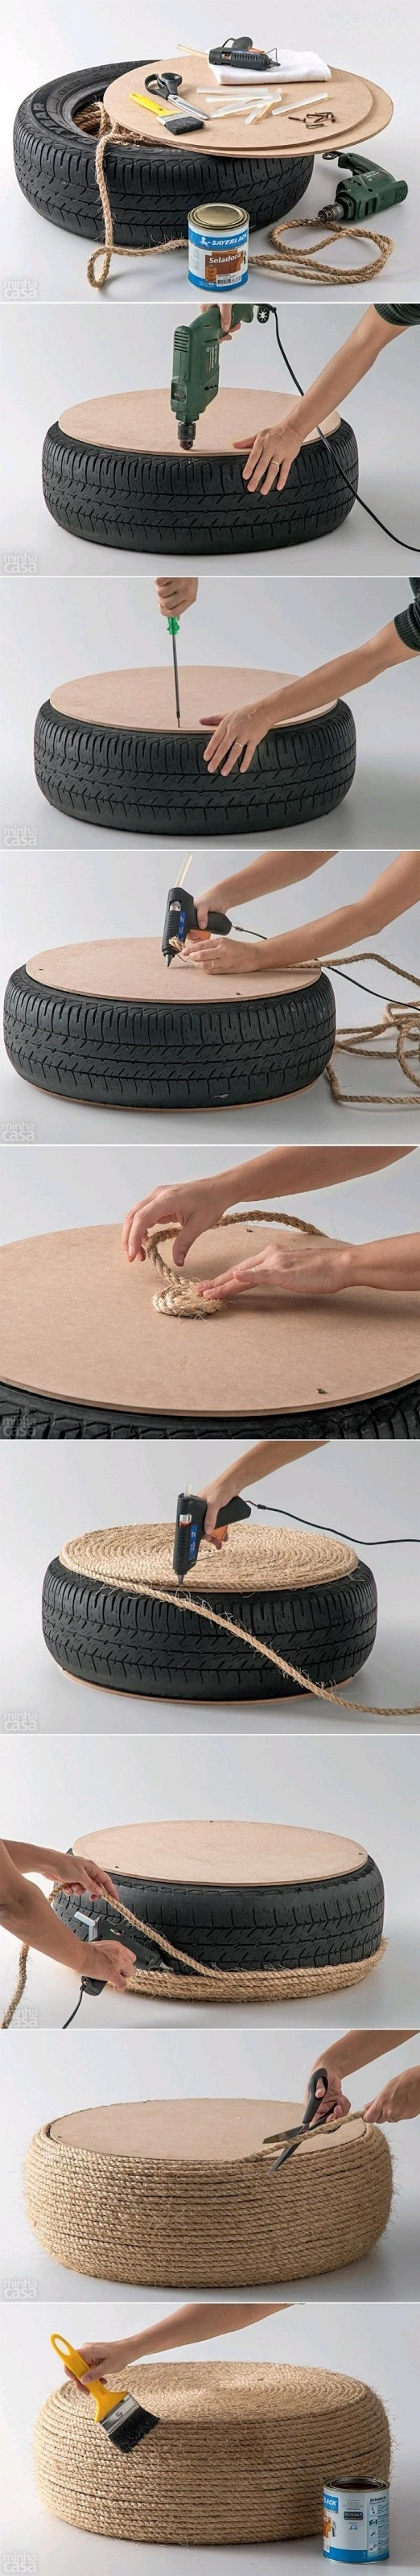 DIY Tire Ottoman… what a transformation…